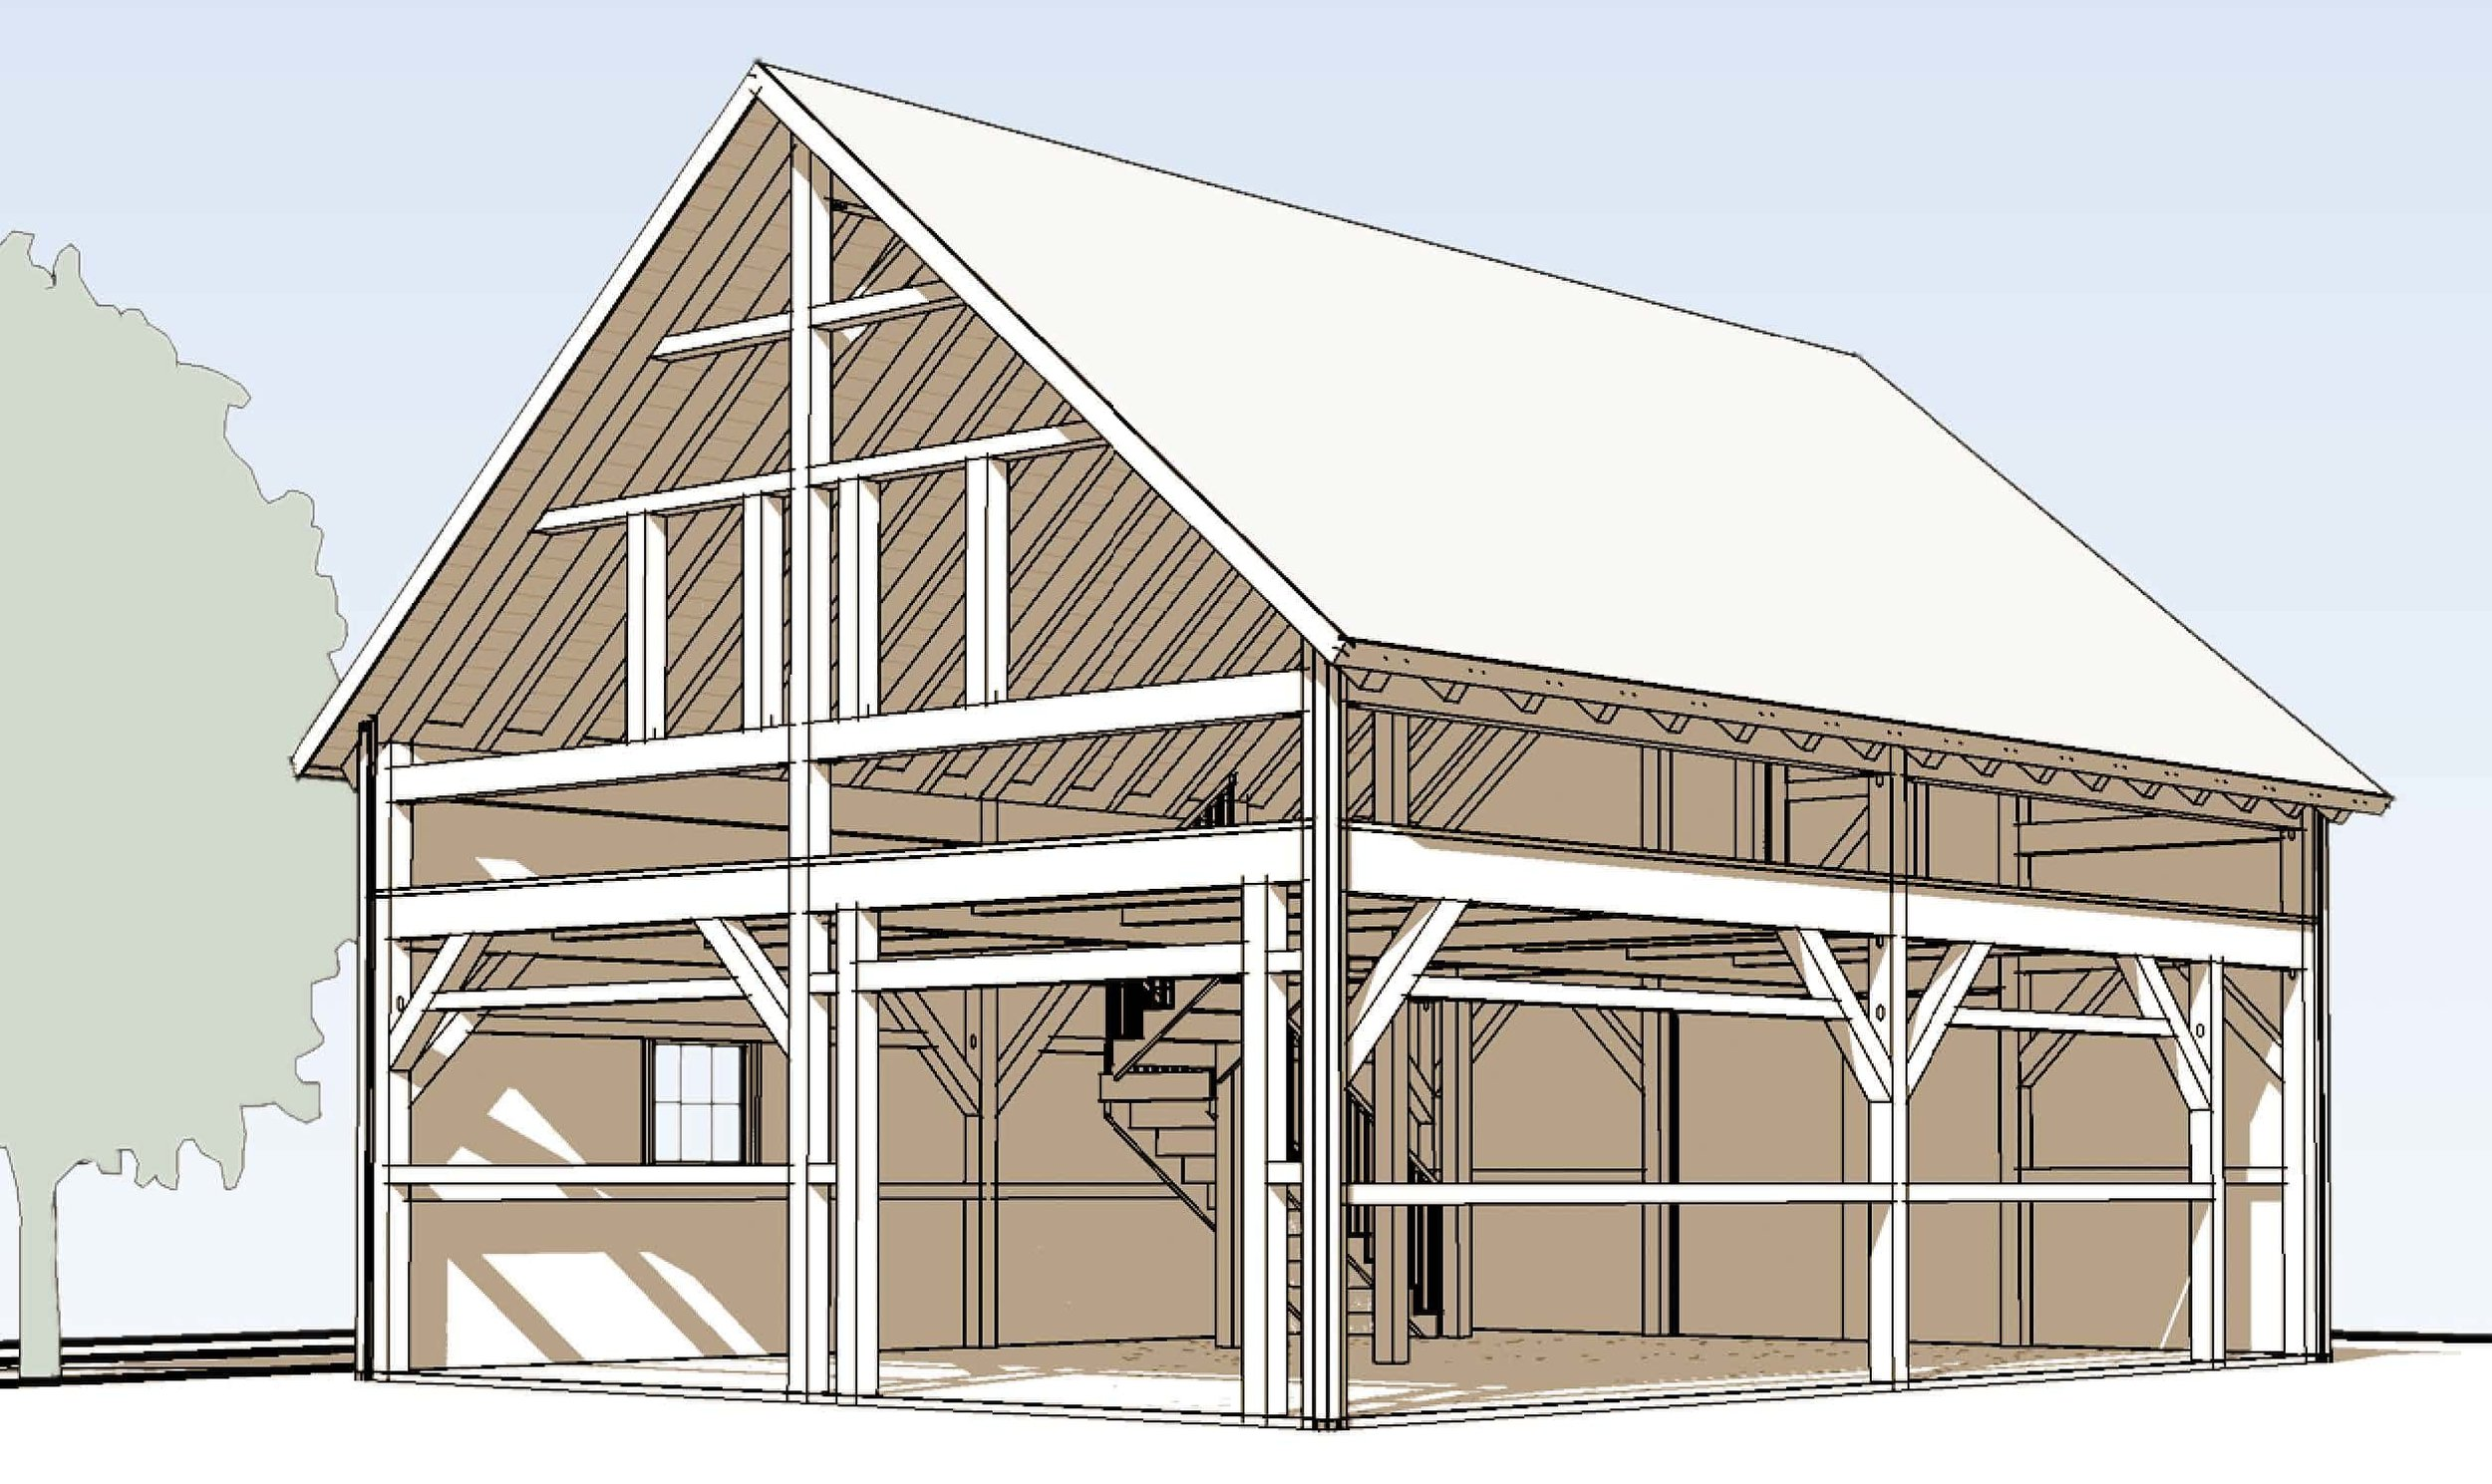 haystack-interior-frame-view.jpg